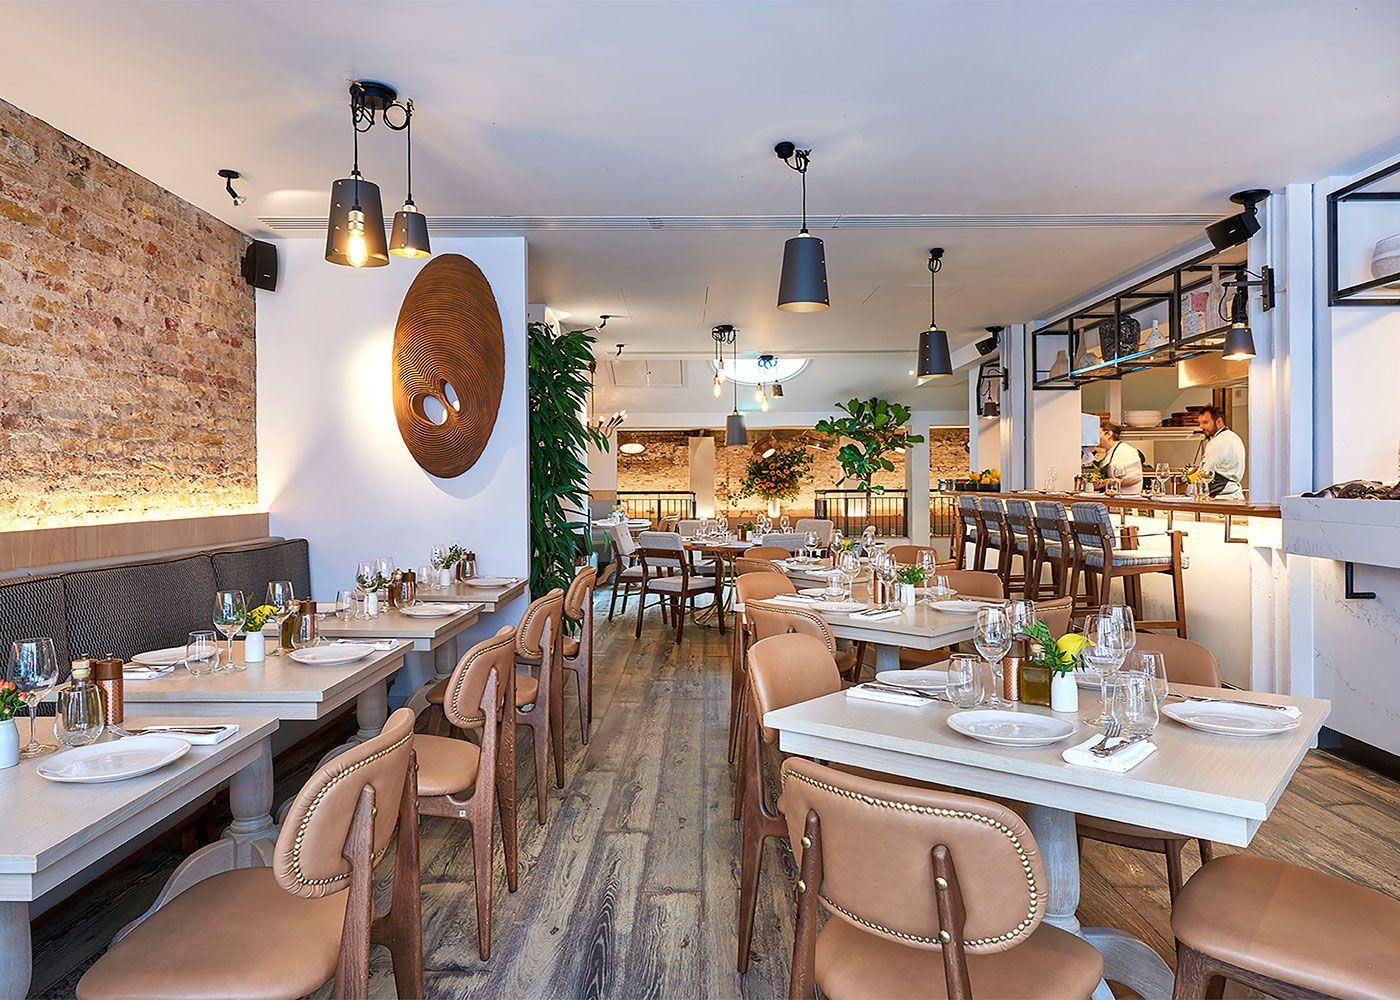 Meraki Restaurant Identity By Dutchscot London Identity Designed Greek Restaurants Rooftop Restaurant Design Restaurant